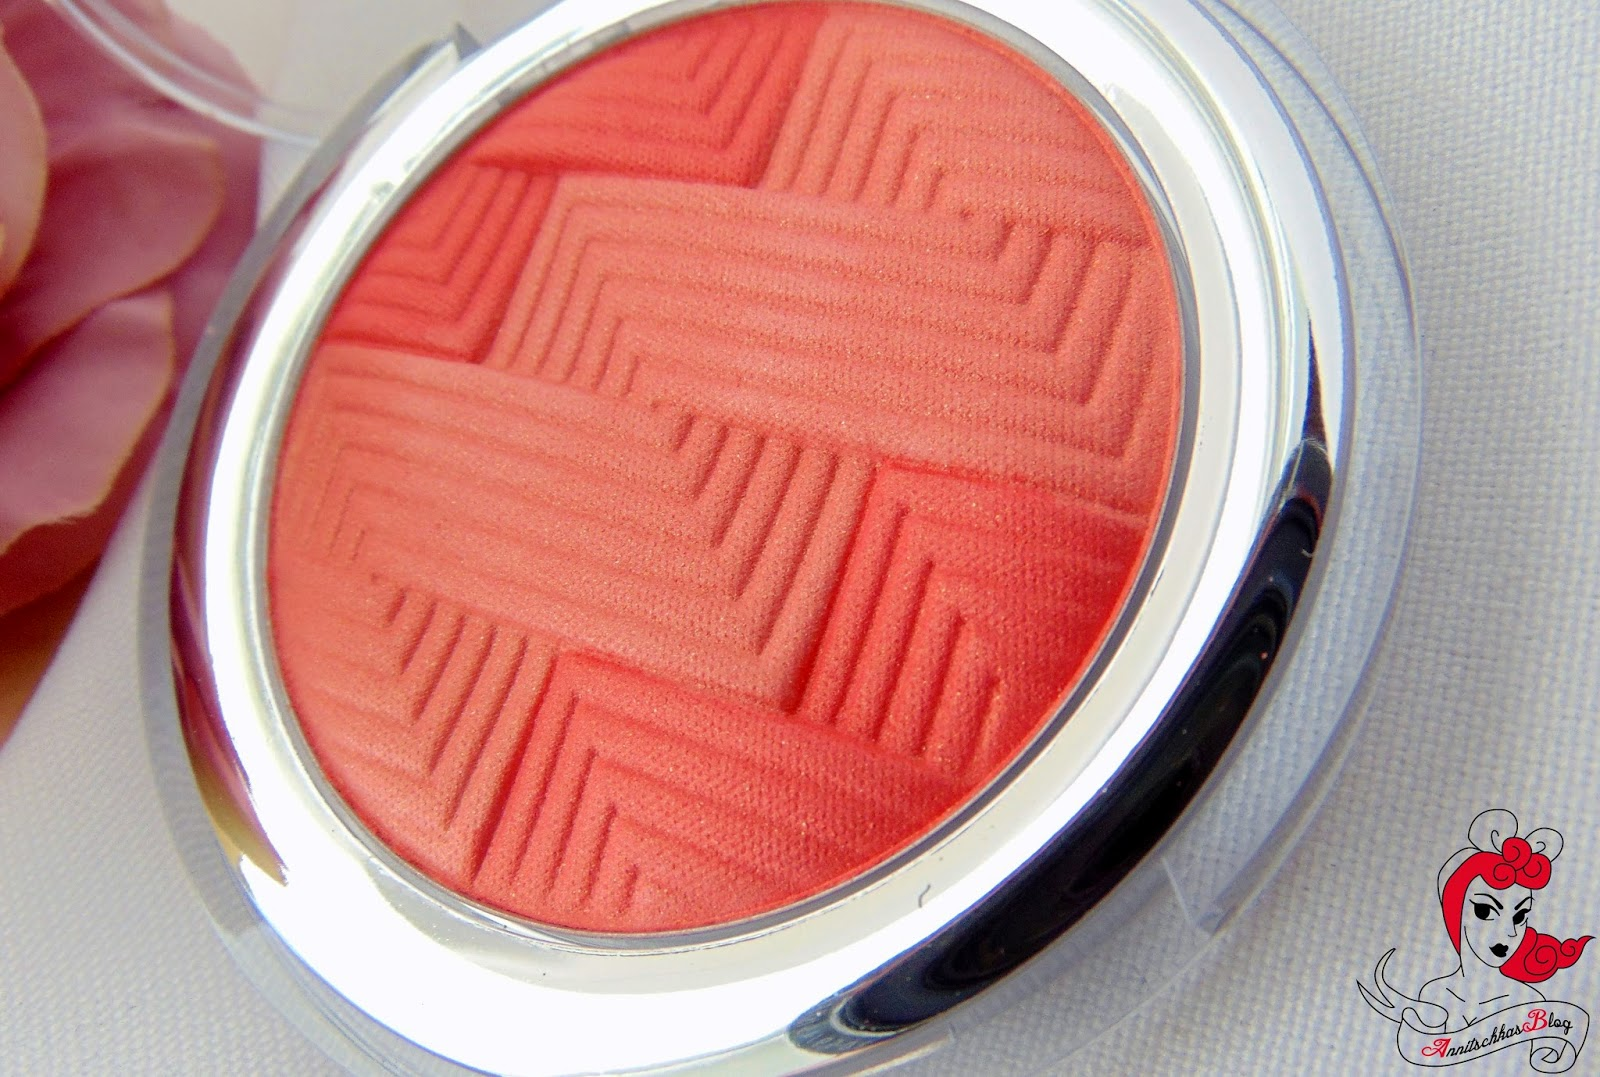 Catrice - Illuminating Blush - Coral me maybe - www.annitschkasblog.de